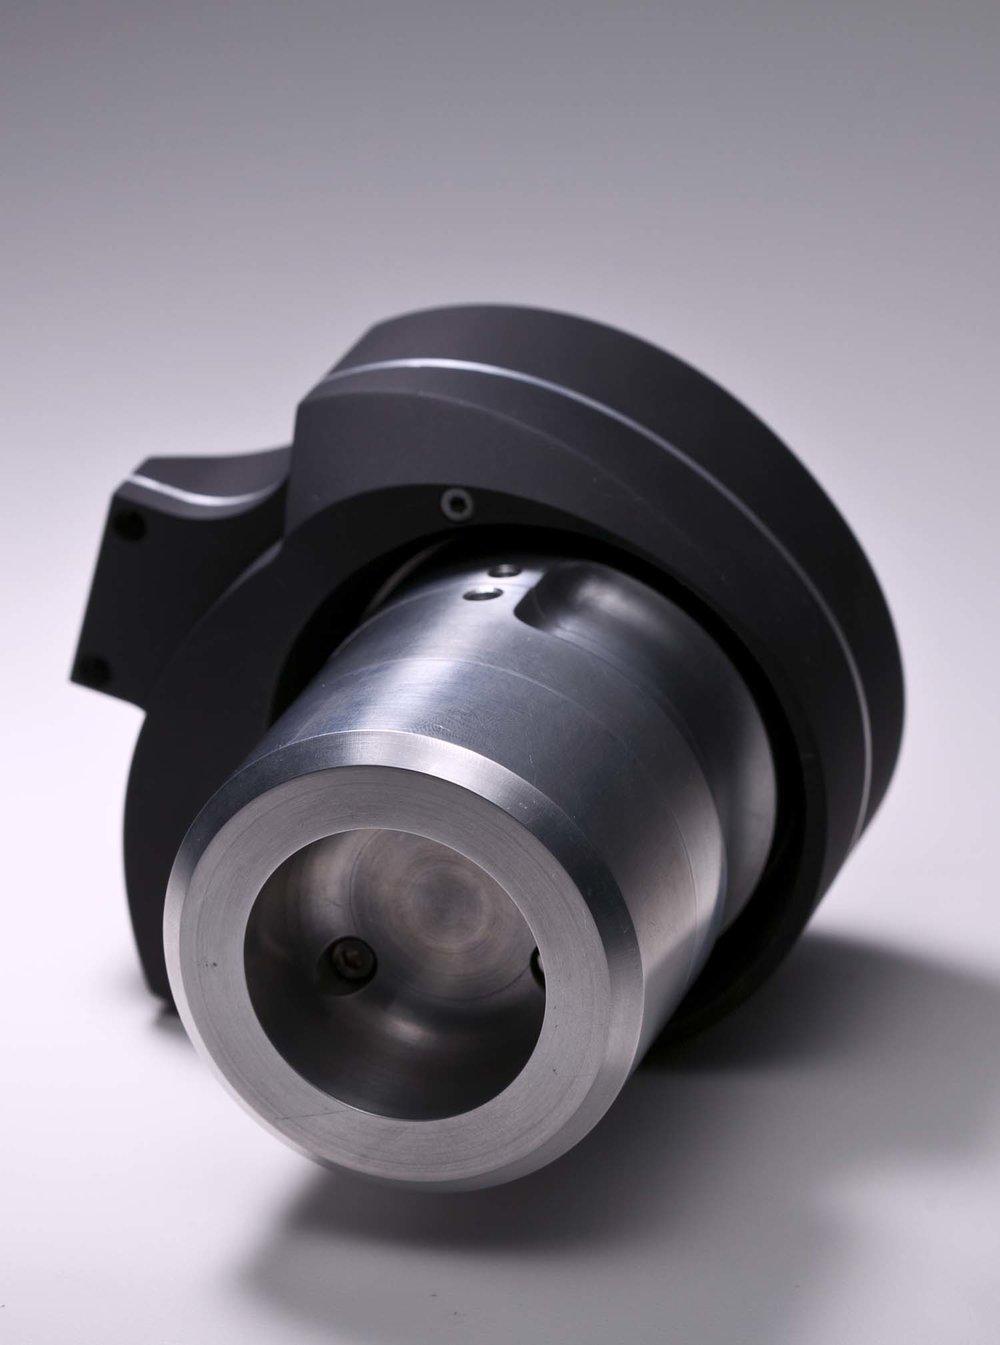 bd wheel